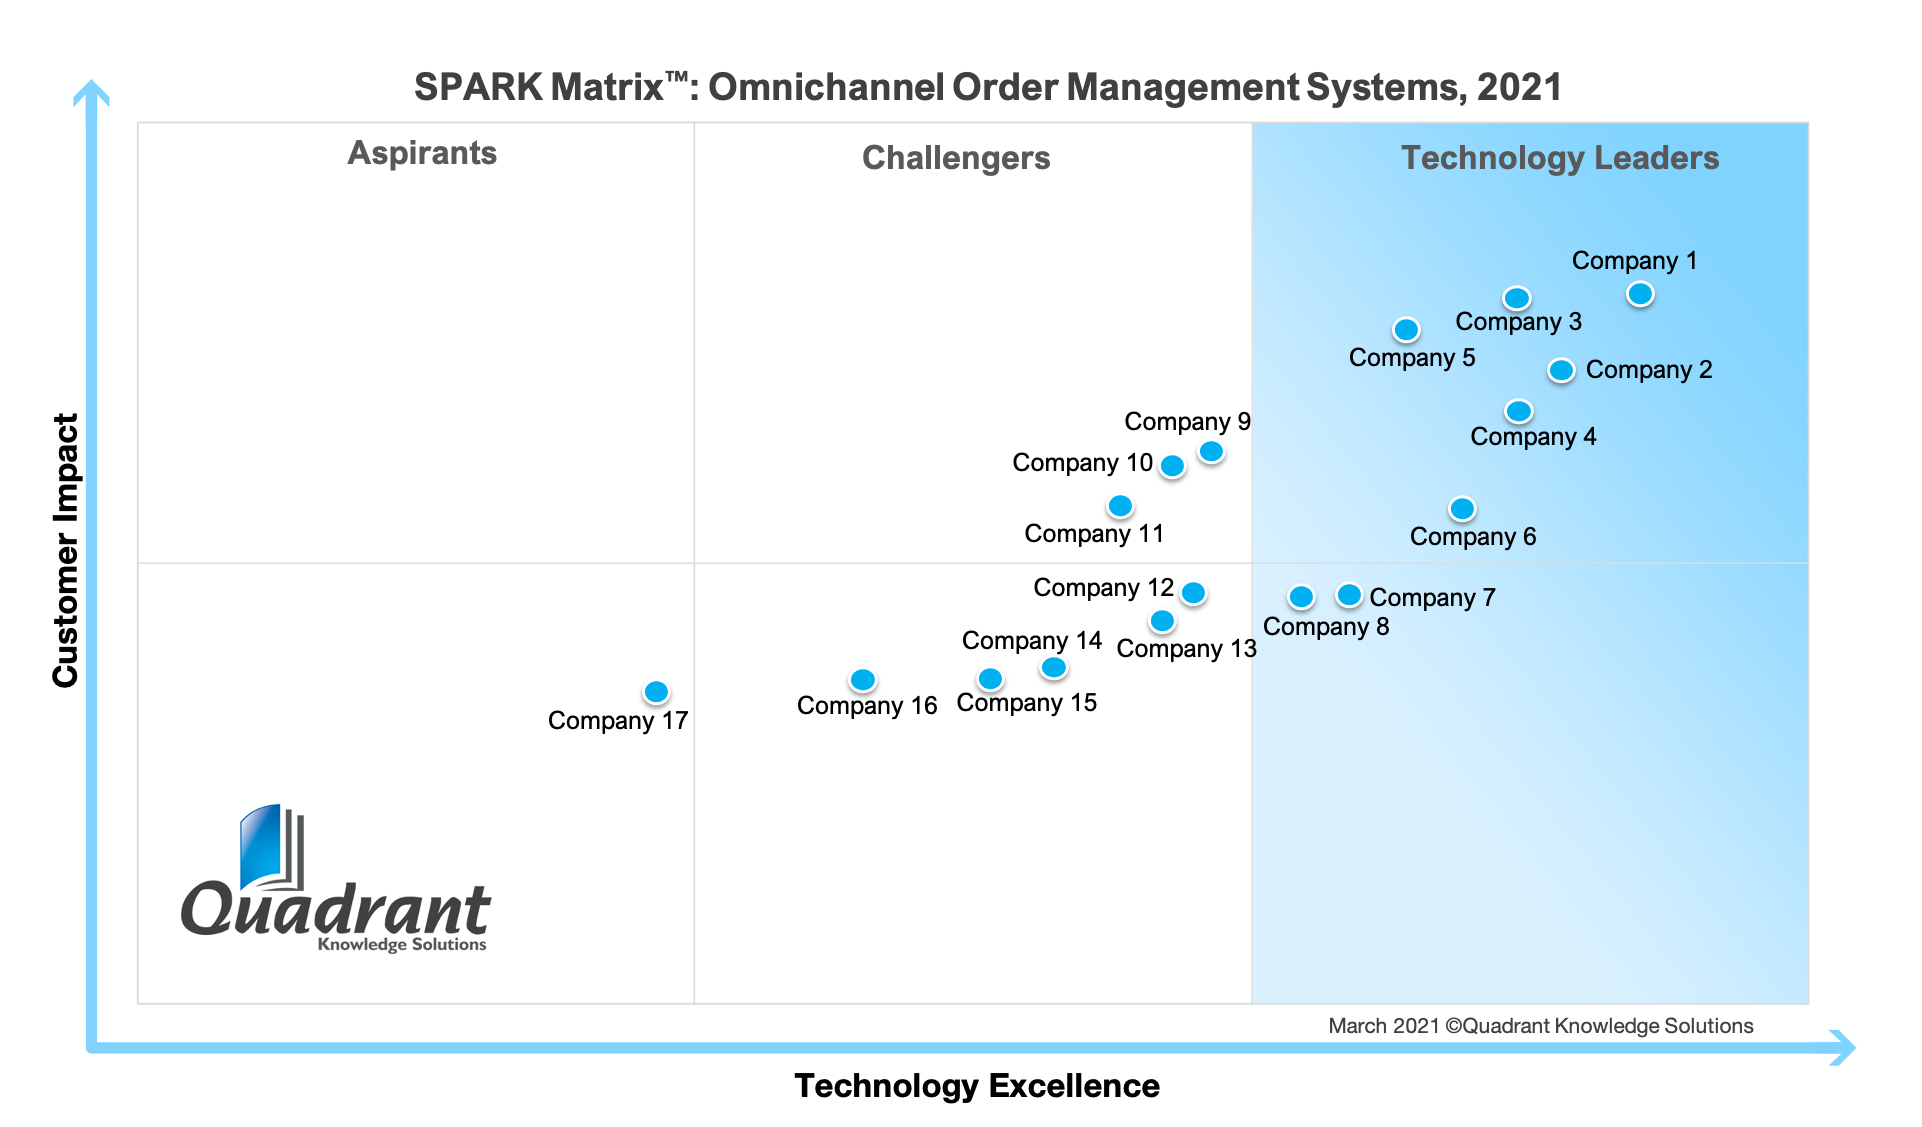 2021 SPARK Matrix-Omnichannel Order Management Systems-Quadrant Knowledge Solutions